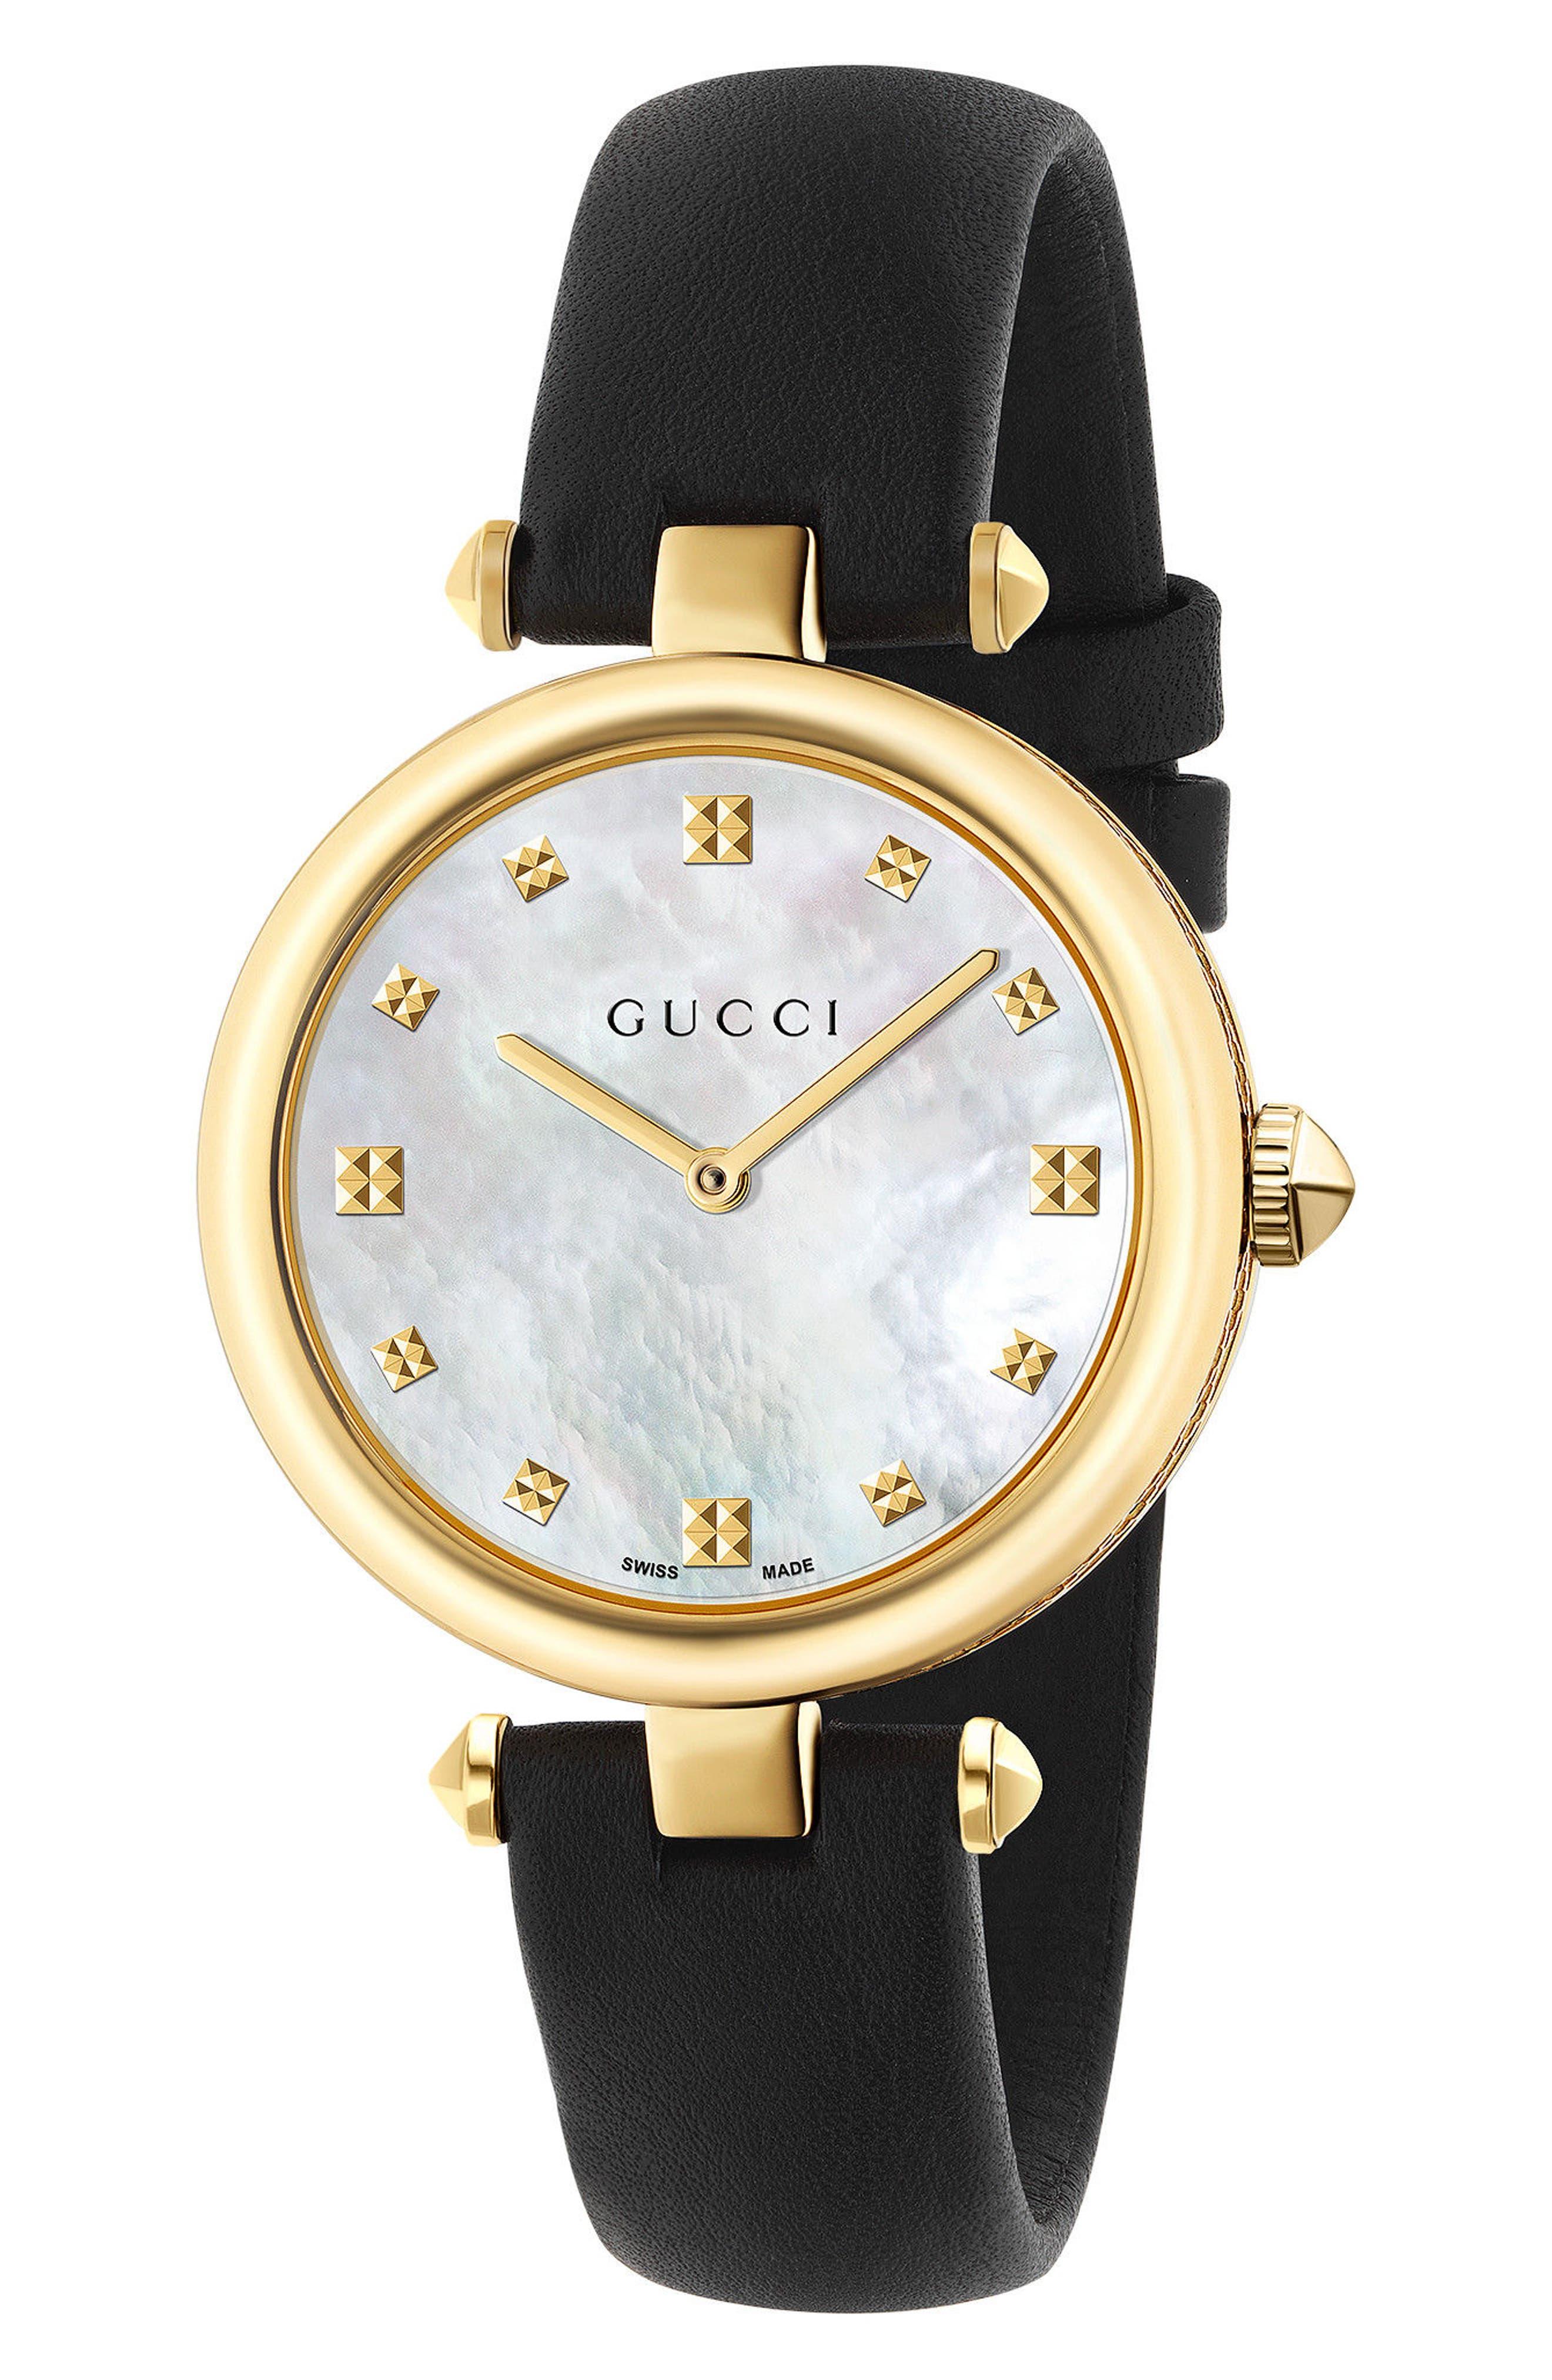 GUCCI Diamantissima Leather Strap Watch, 32mm, Main, color, BLACK/ MOP/ GOLD